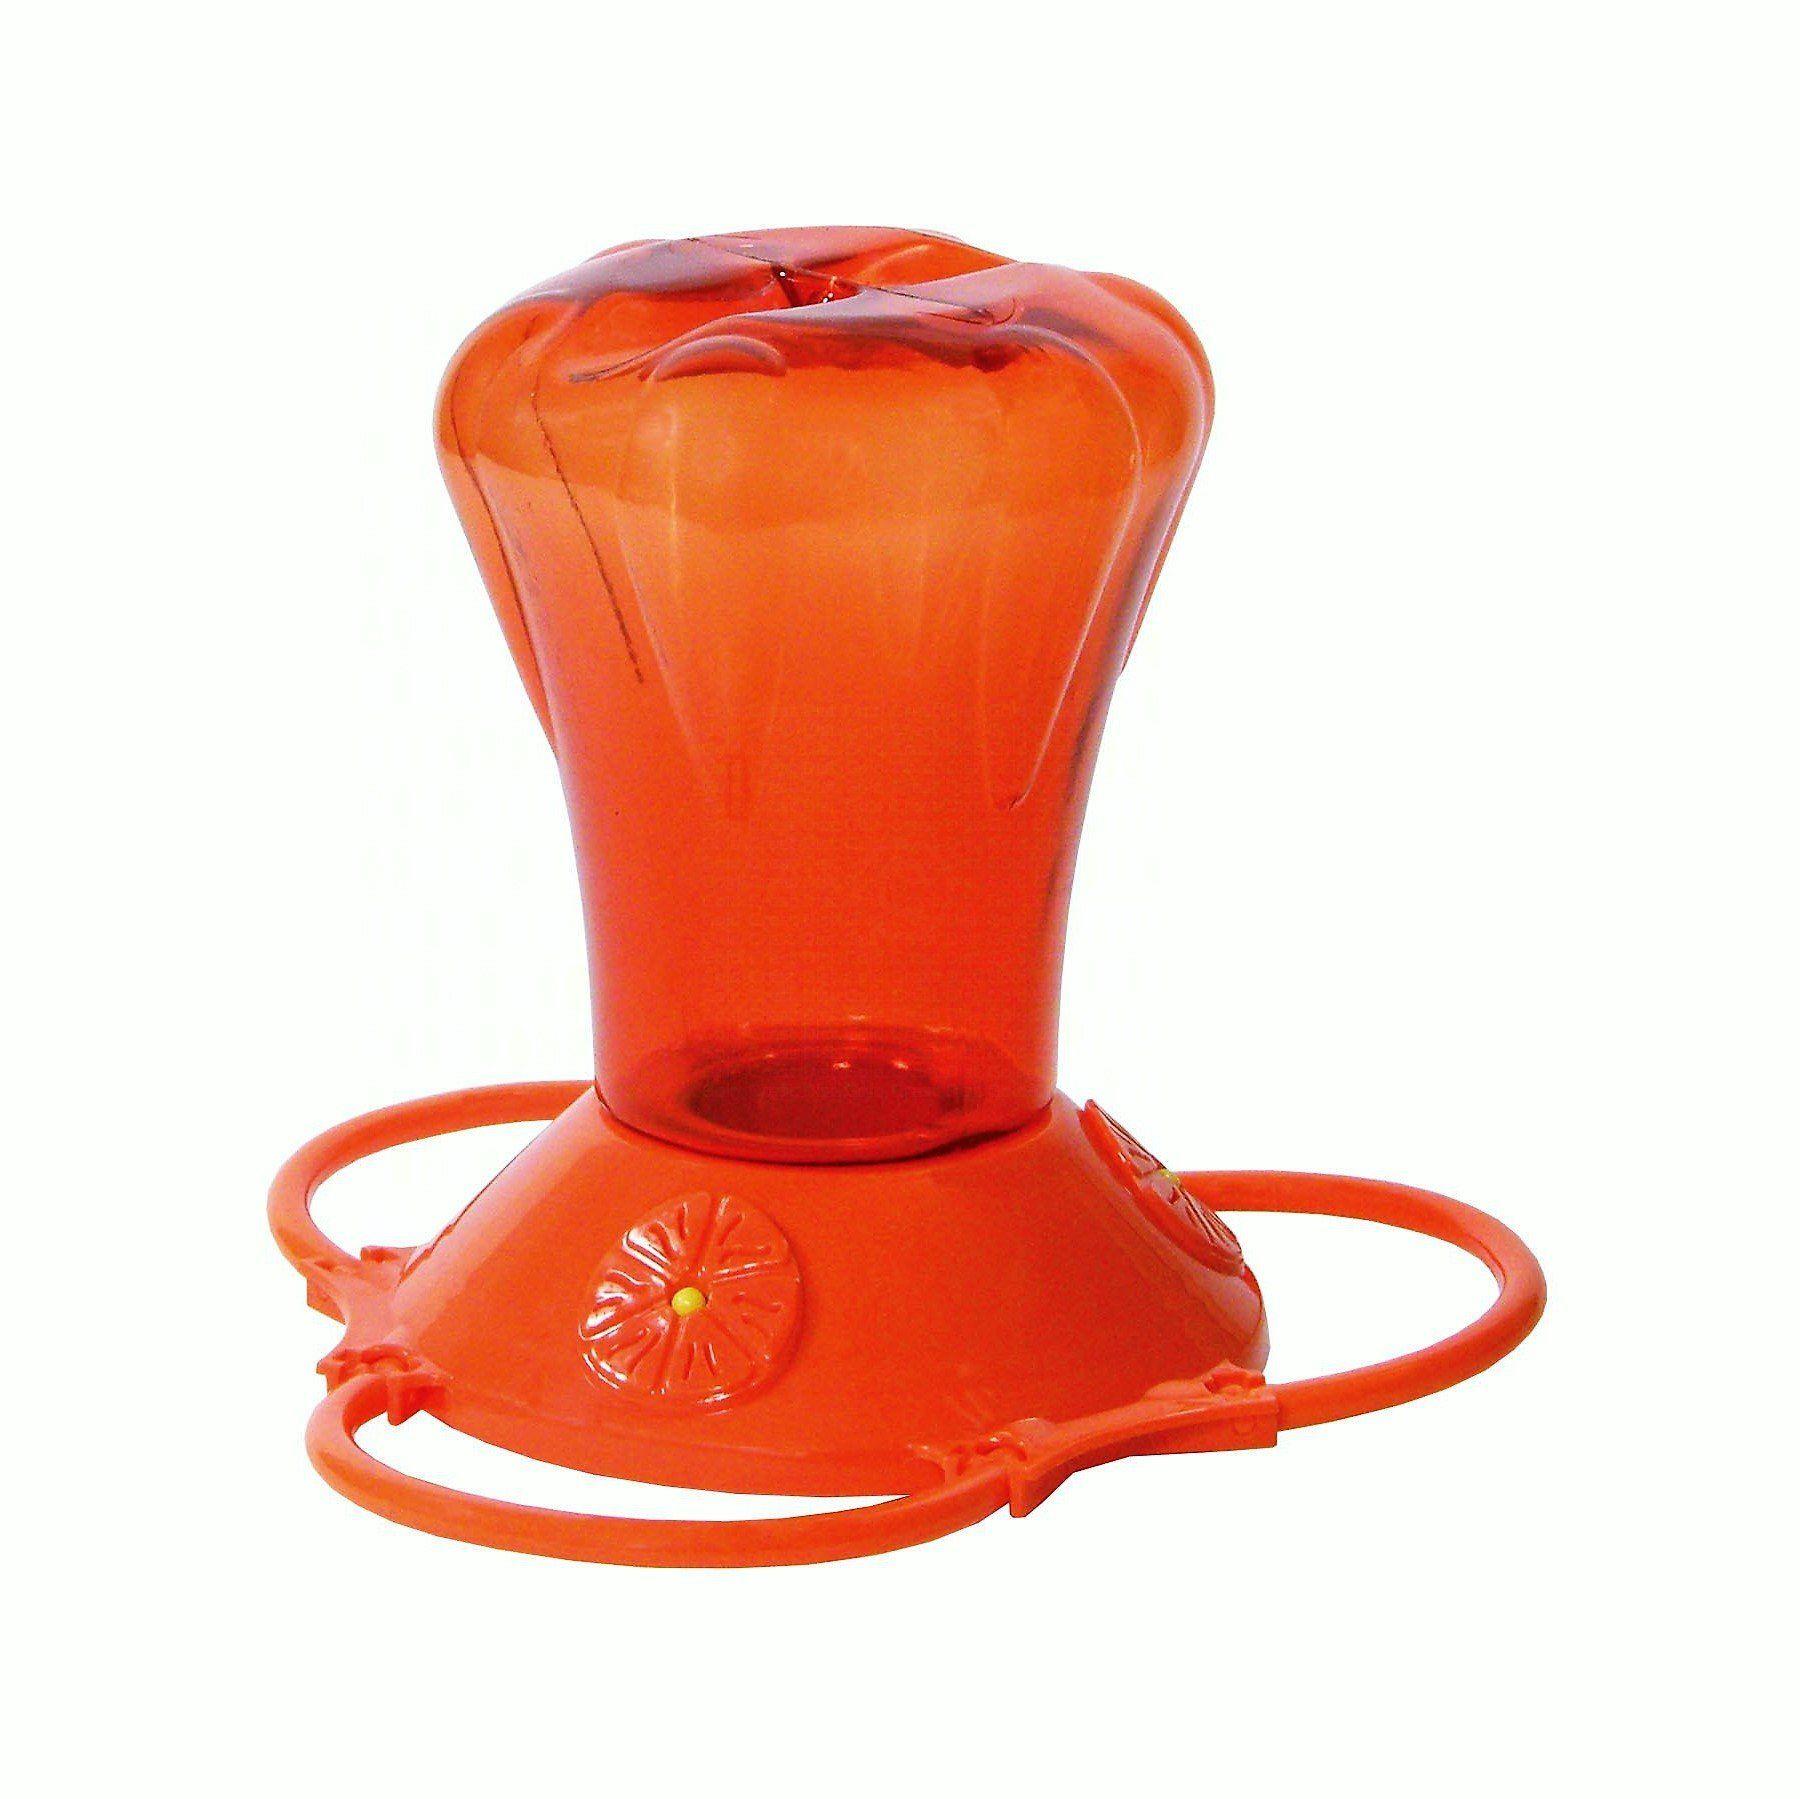 Oriole Feeder Orange 28 oz Humming bird feeders, Oriole